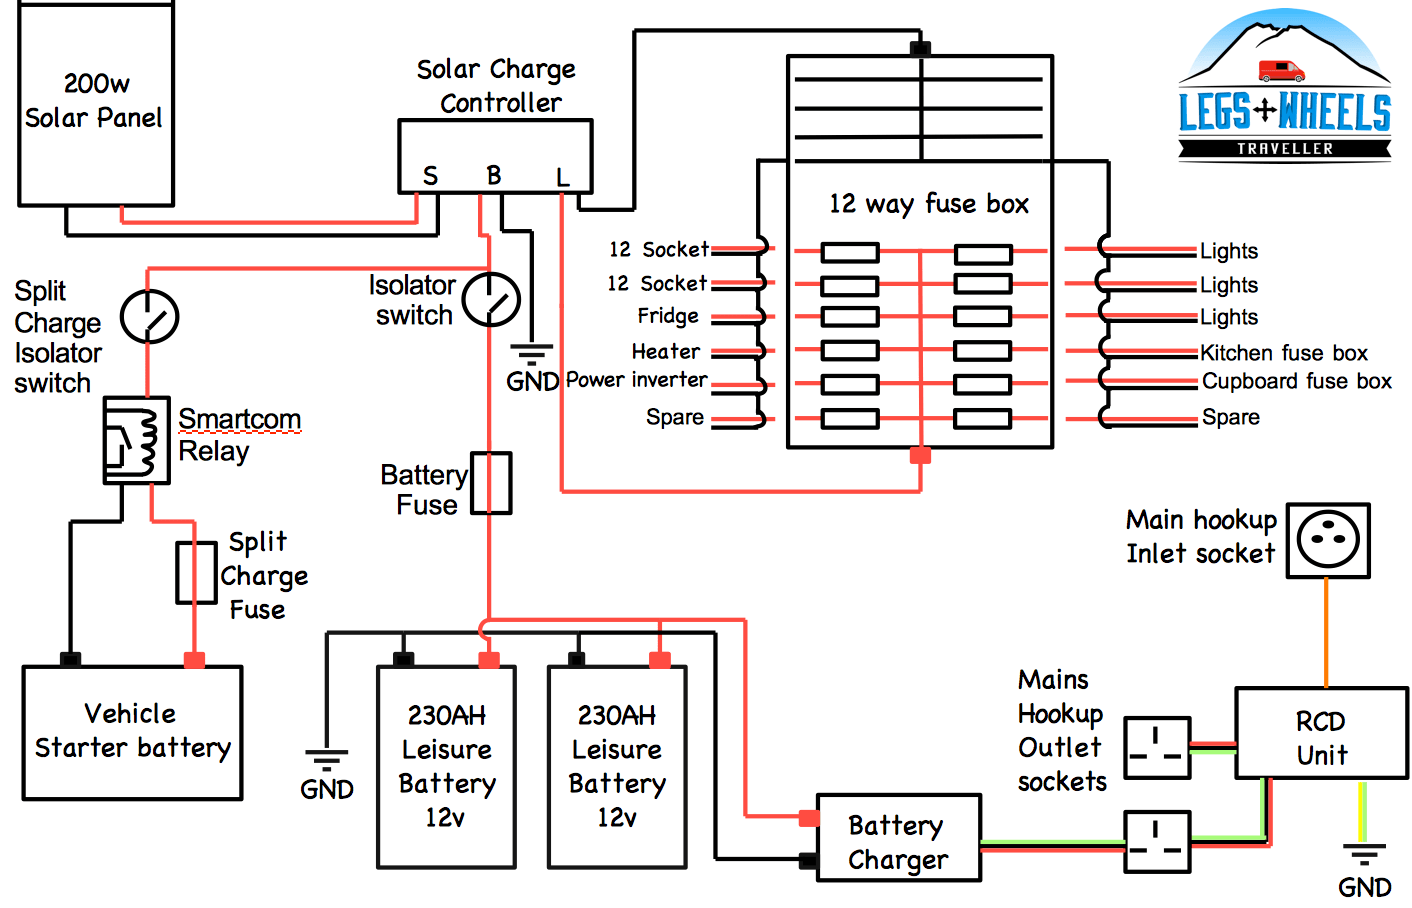 12v electric system diagram in ford transit van conversion [ 1412 x 908 Pixel ]